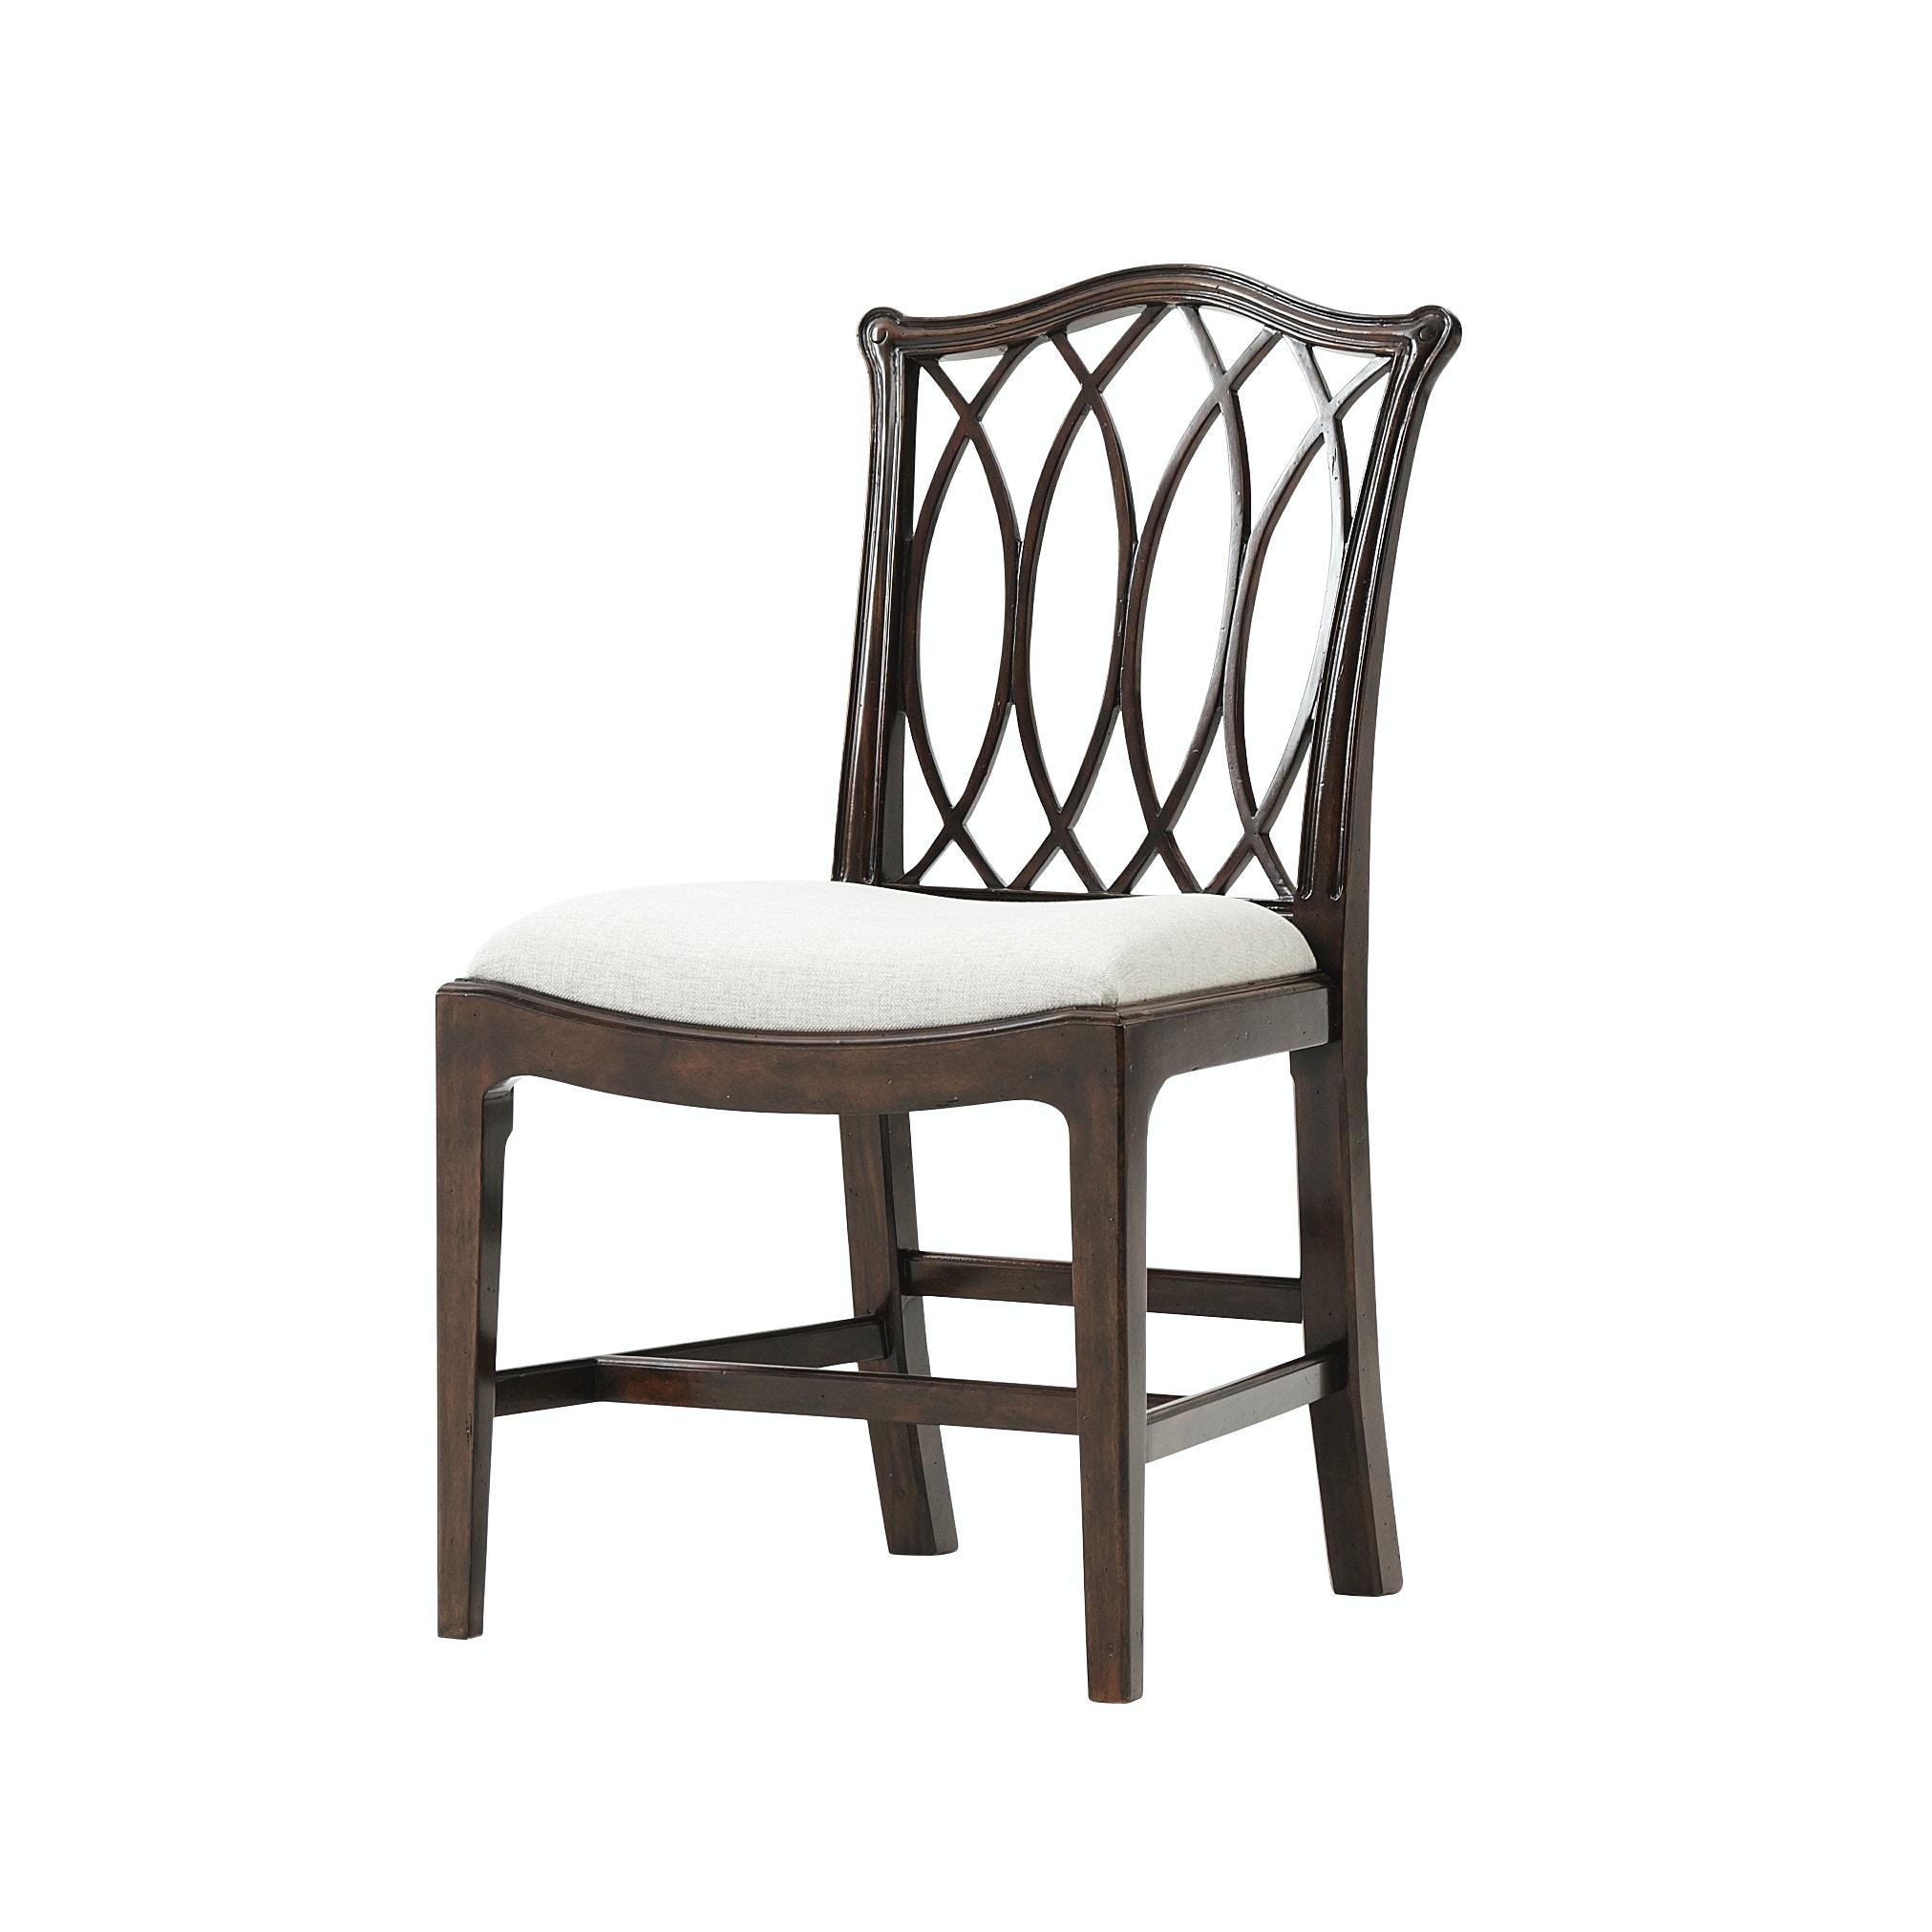 Genial Theodore Alexander Furniture The Trellis Chair 4000 566.1AJM